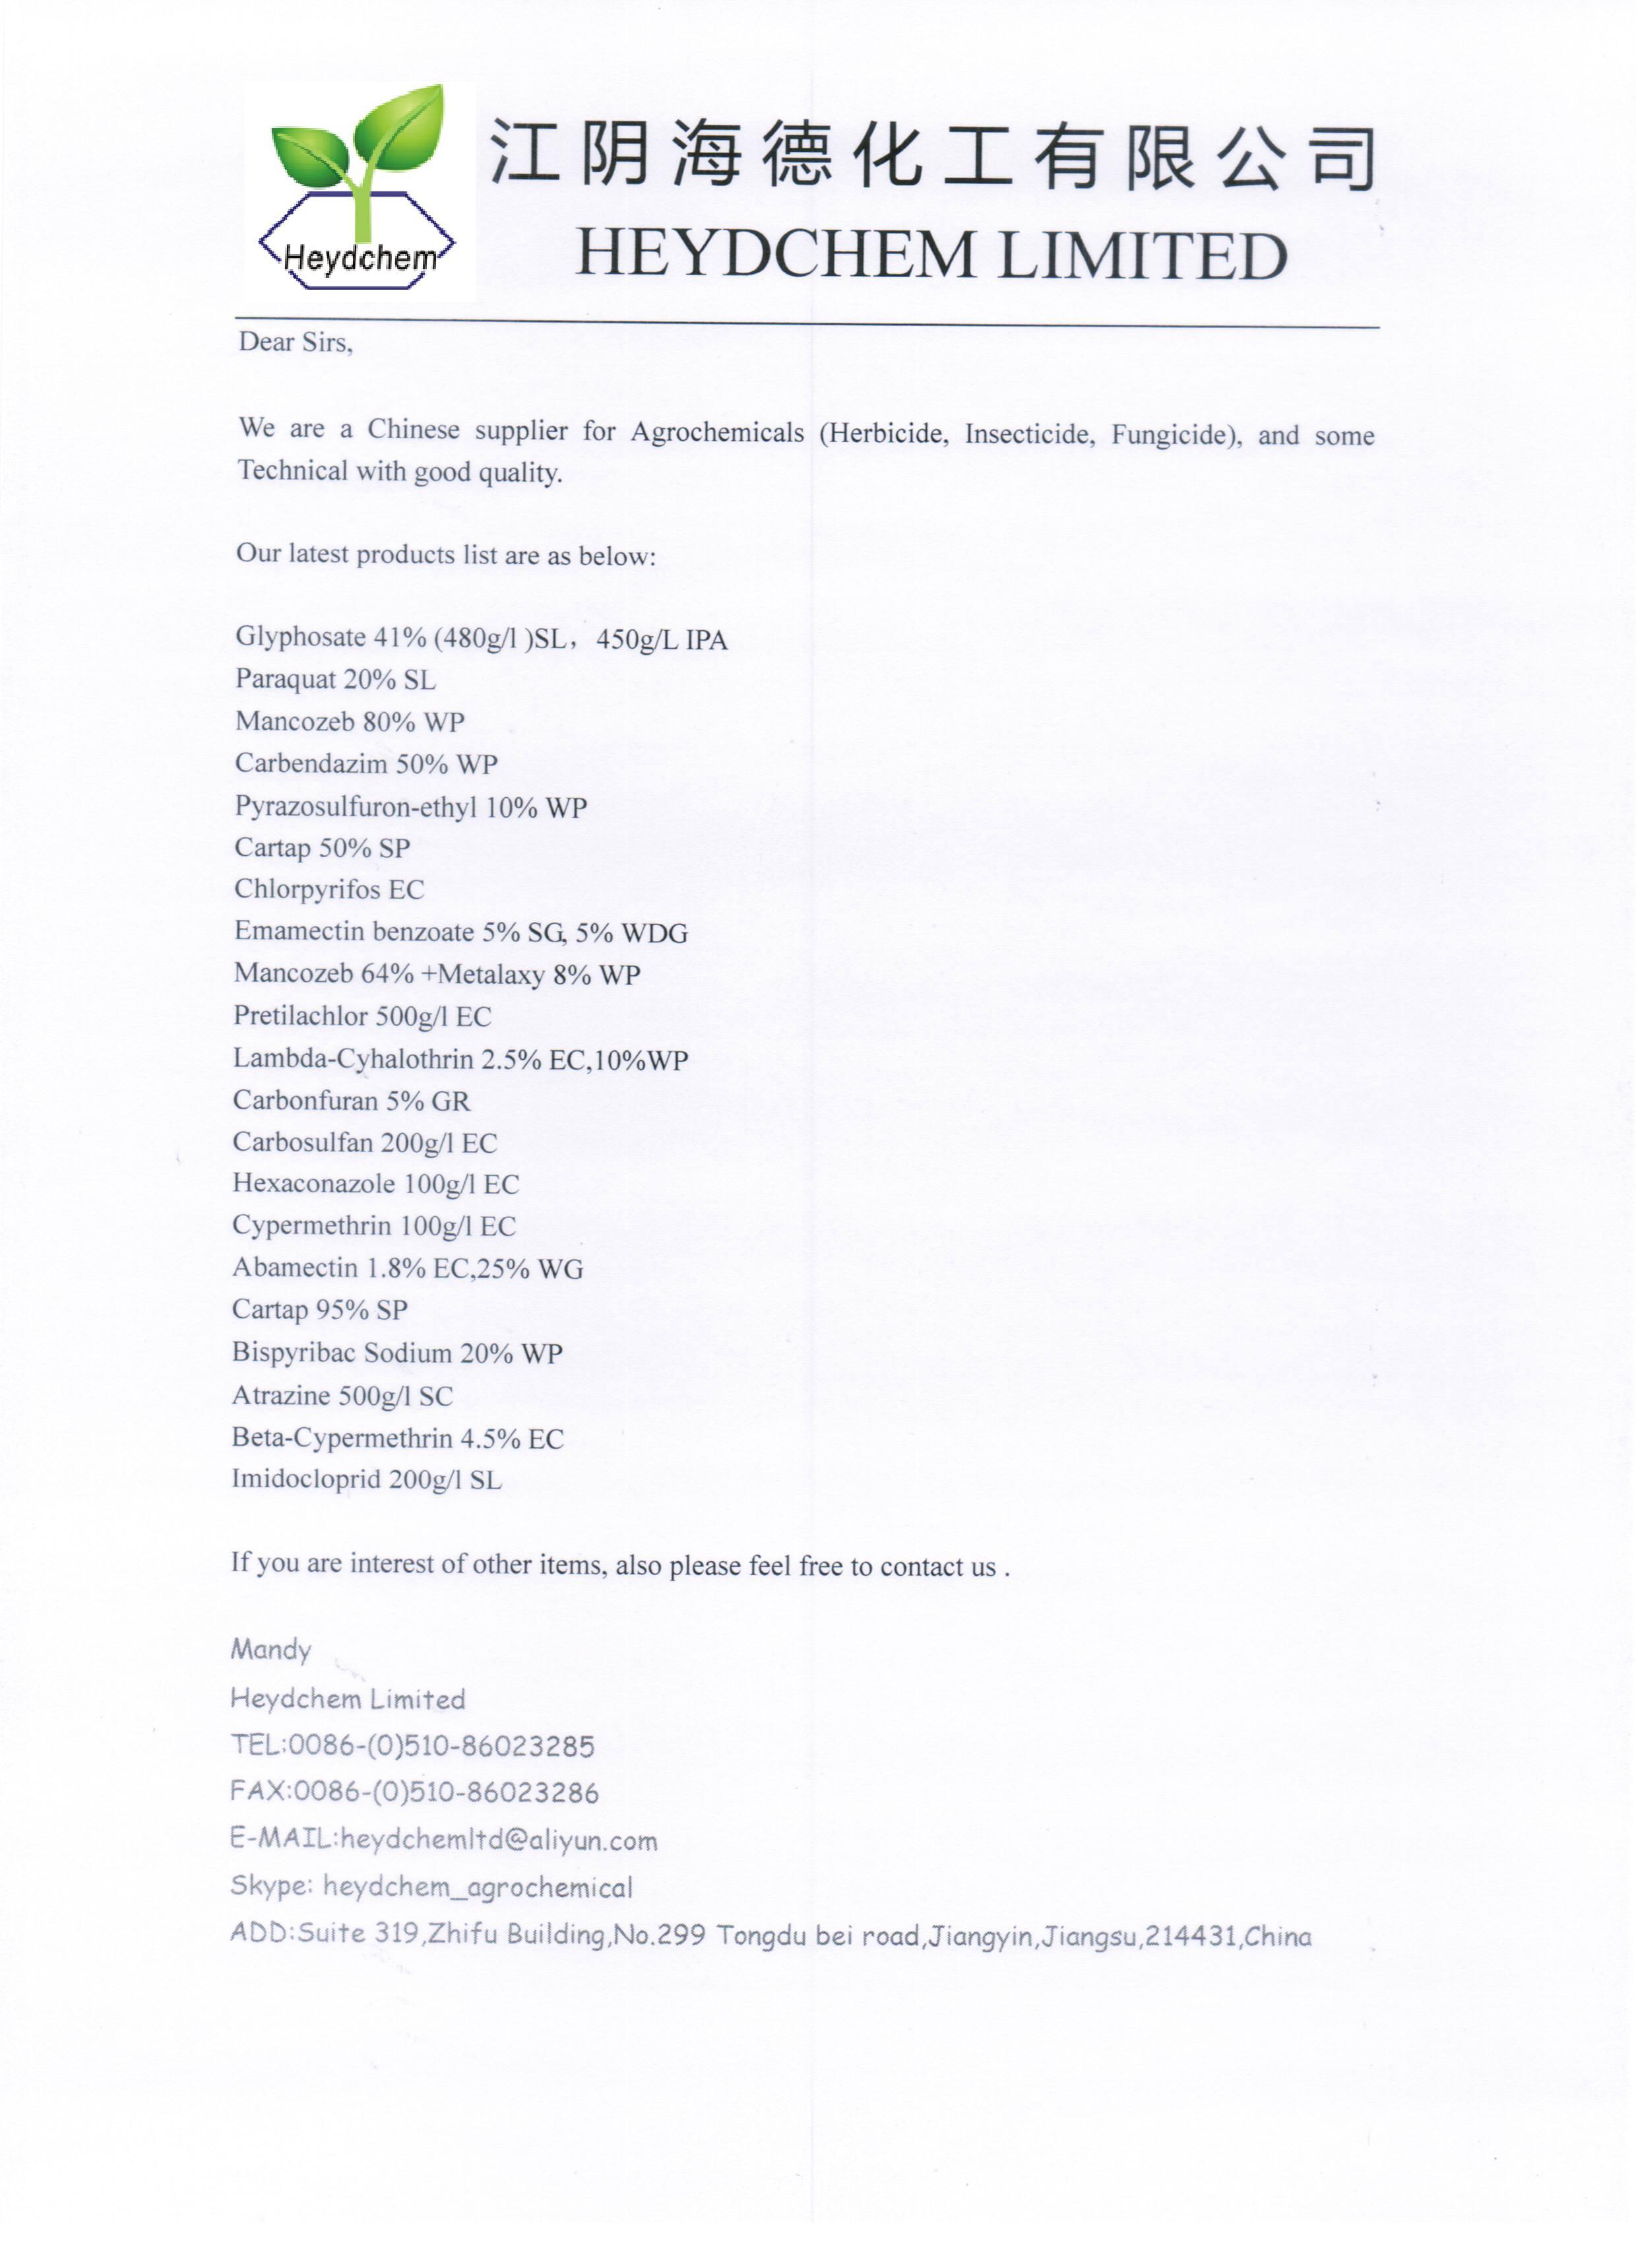 Pyrazosulfuron-ethyl 10% WP